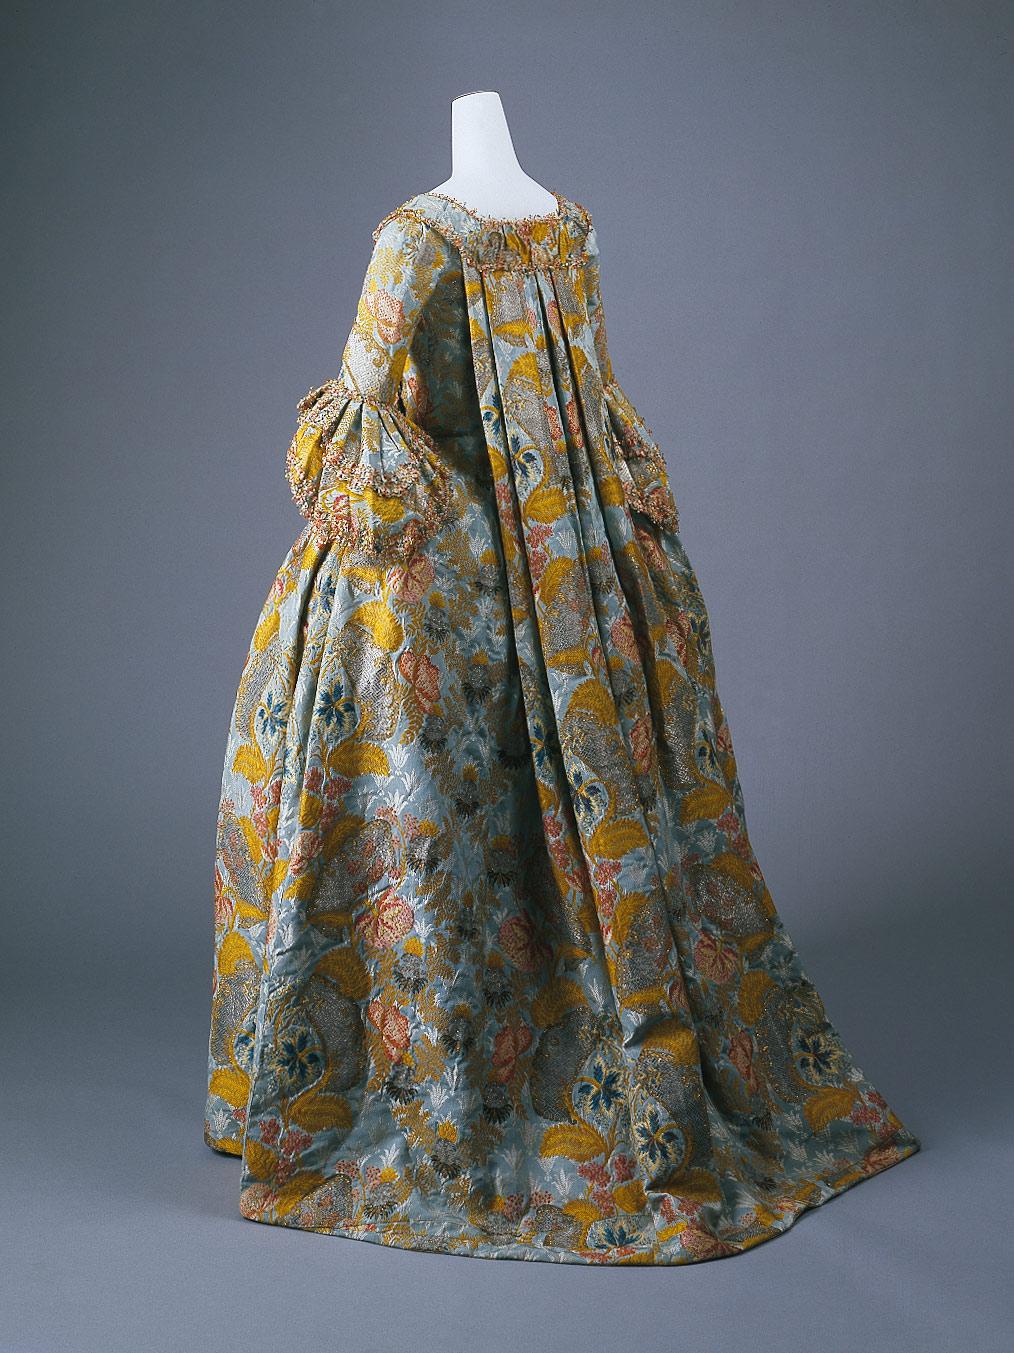 18th century dresses fashion